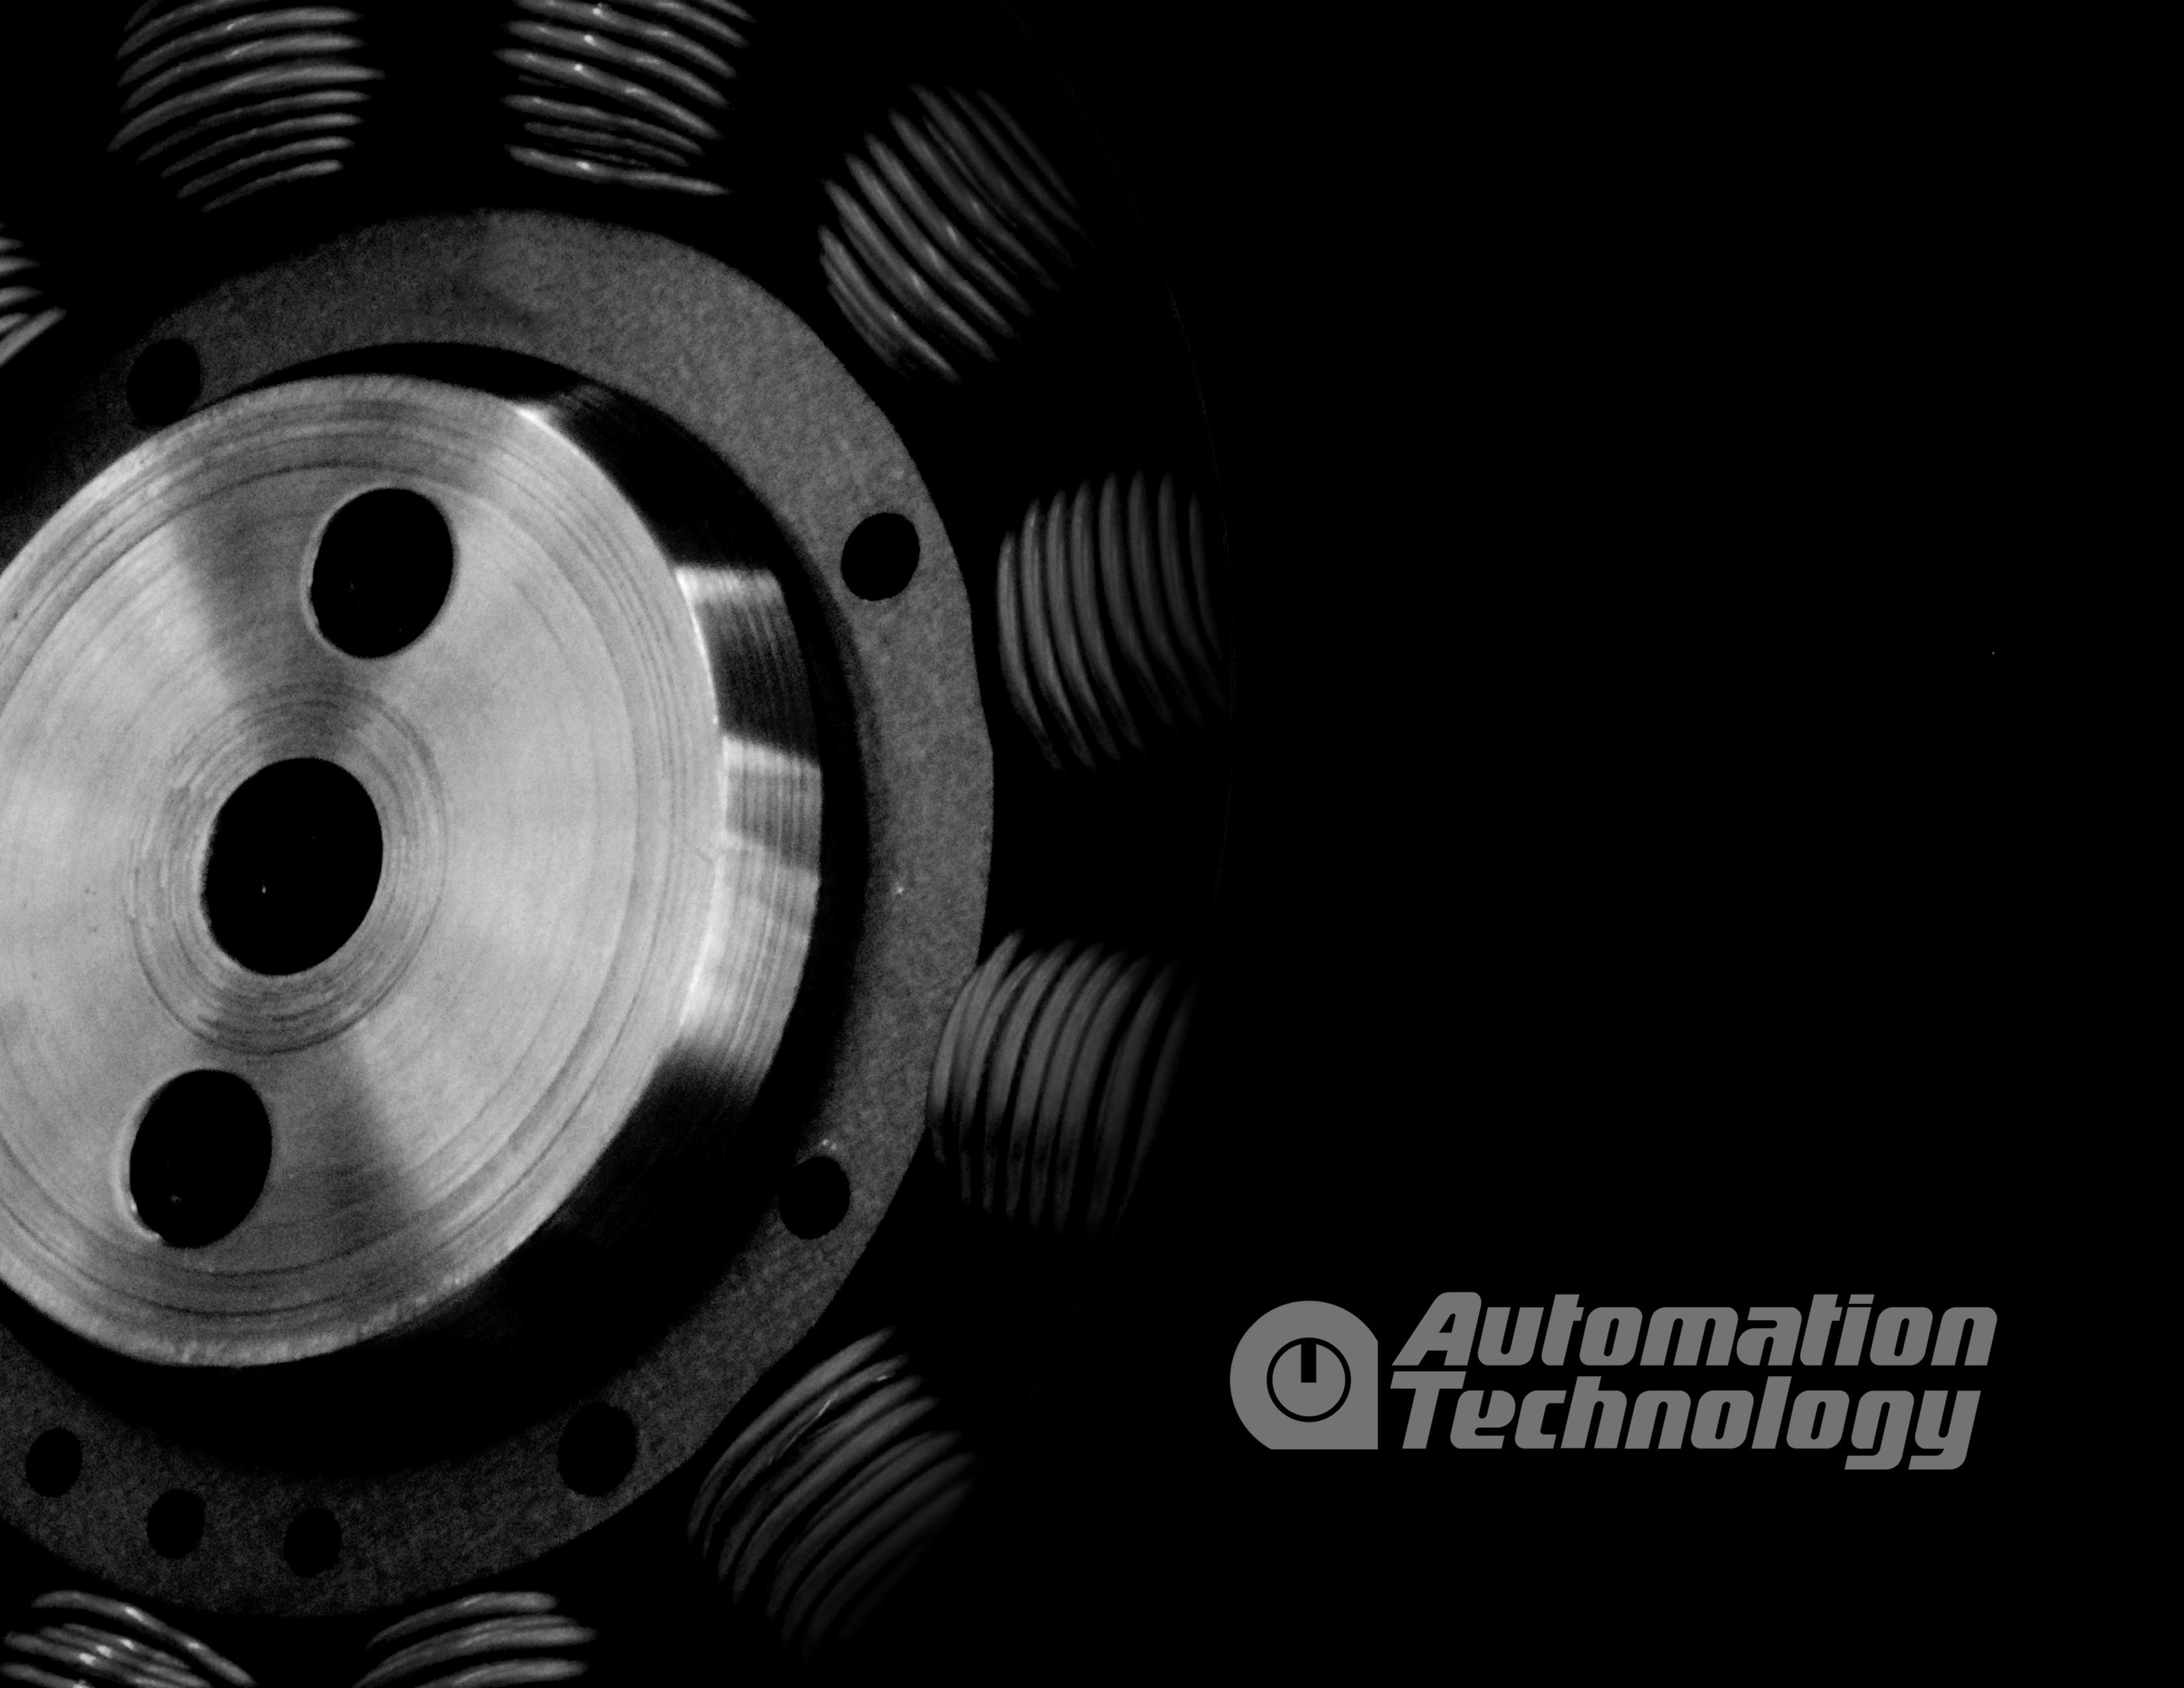 Automation Technology